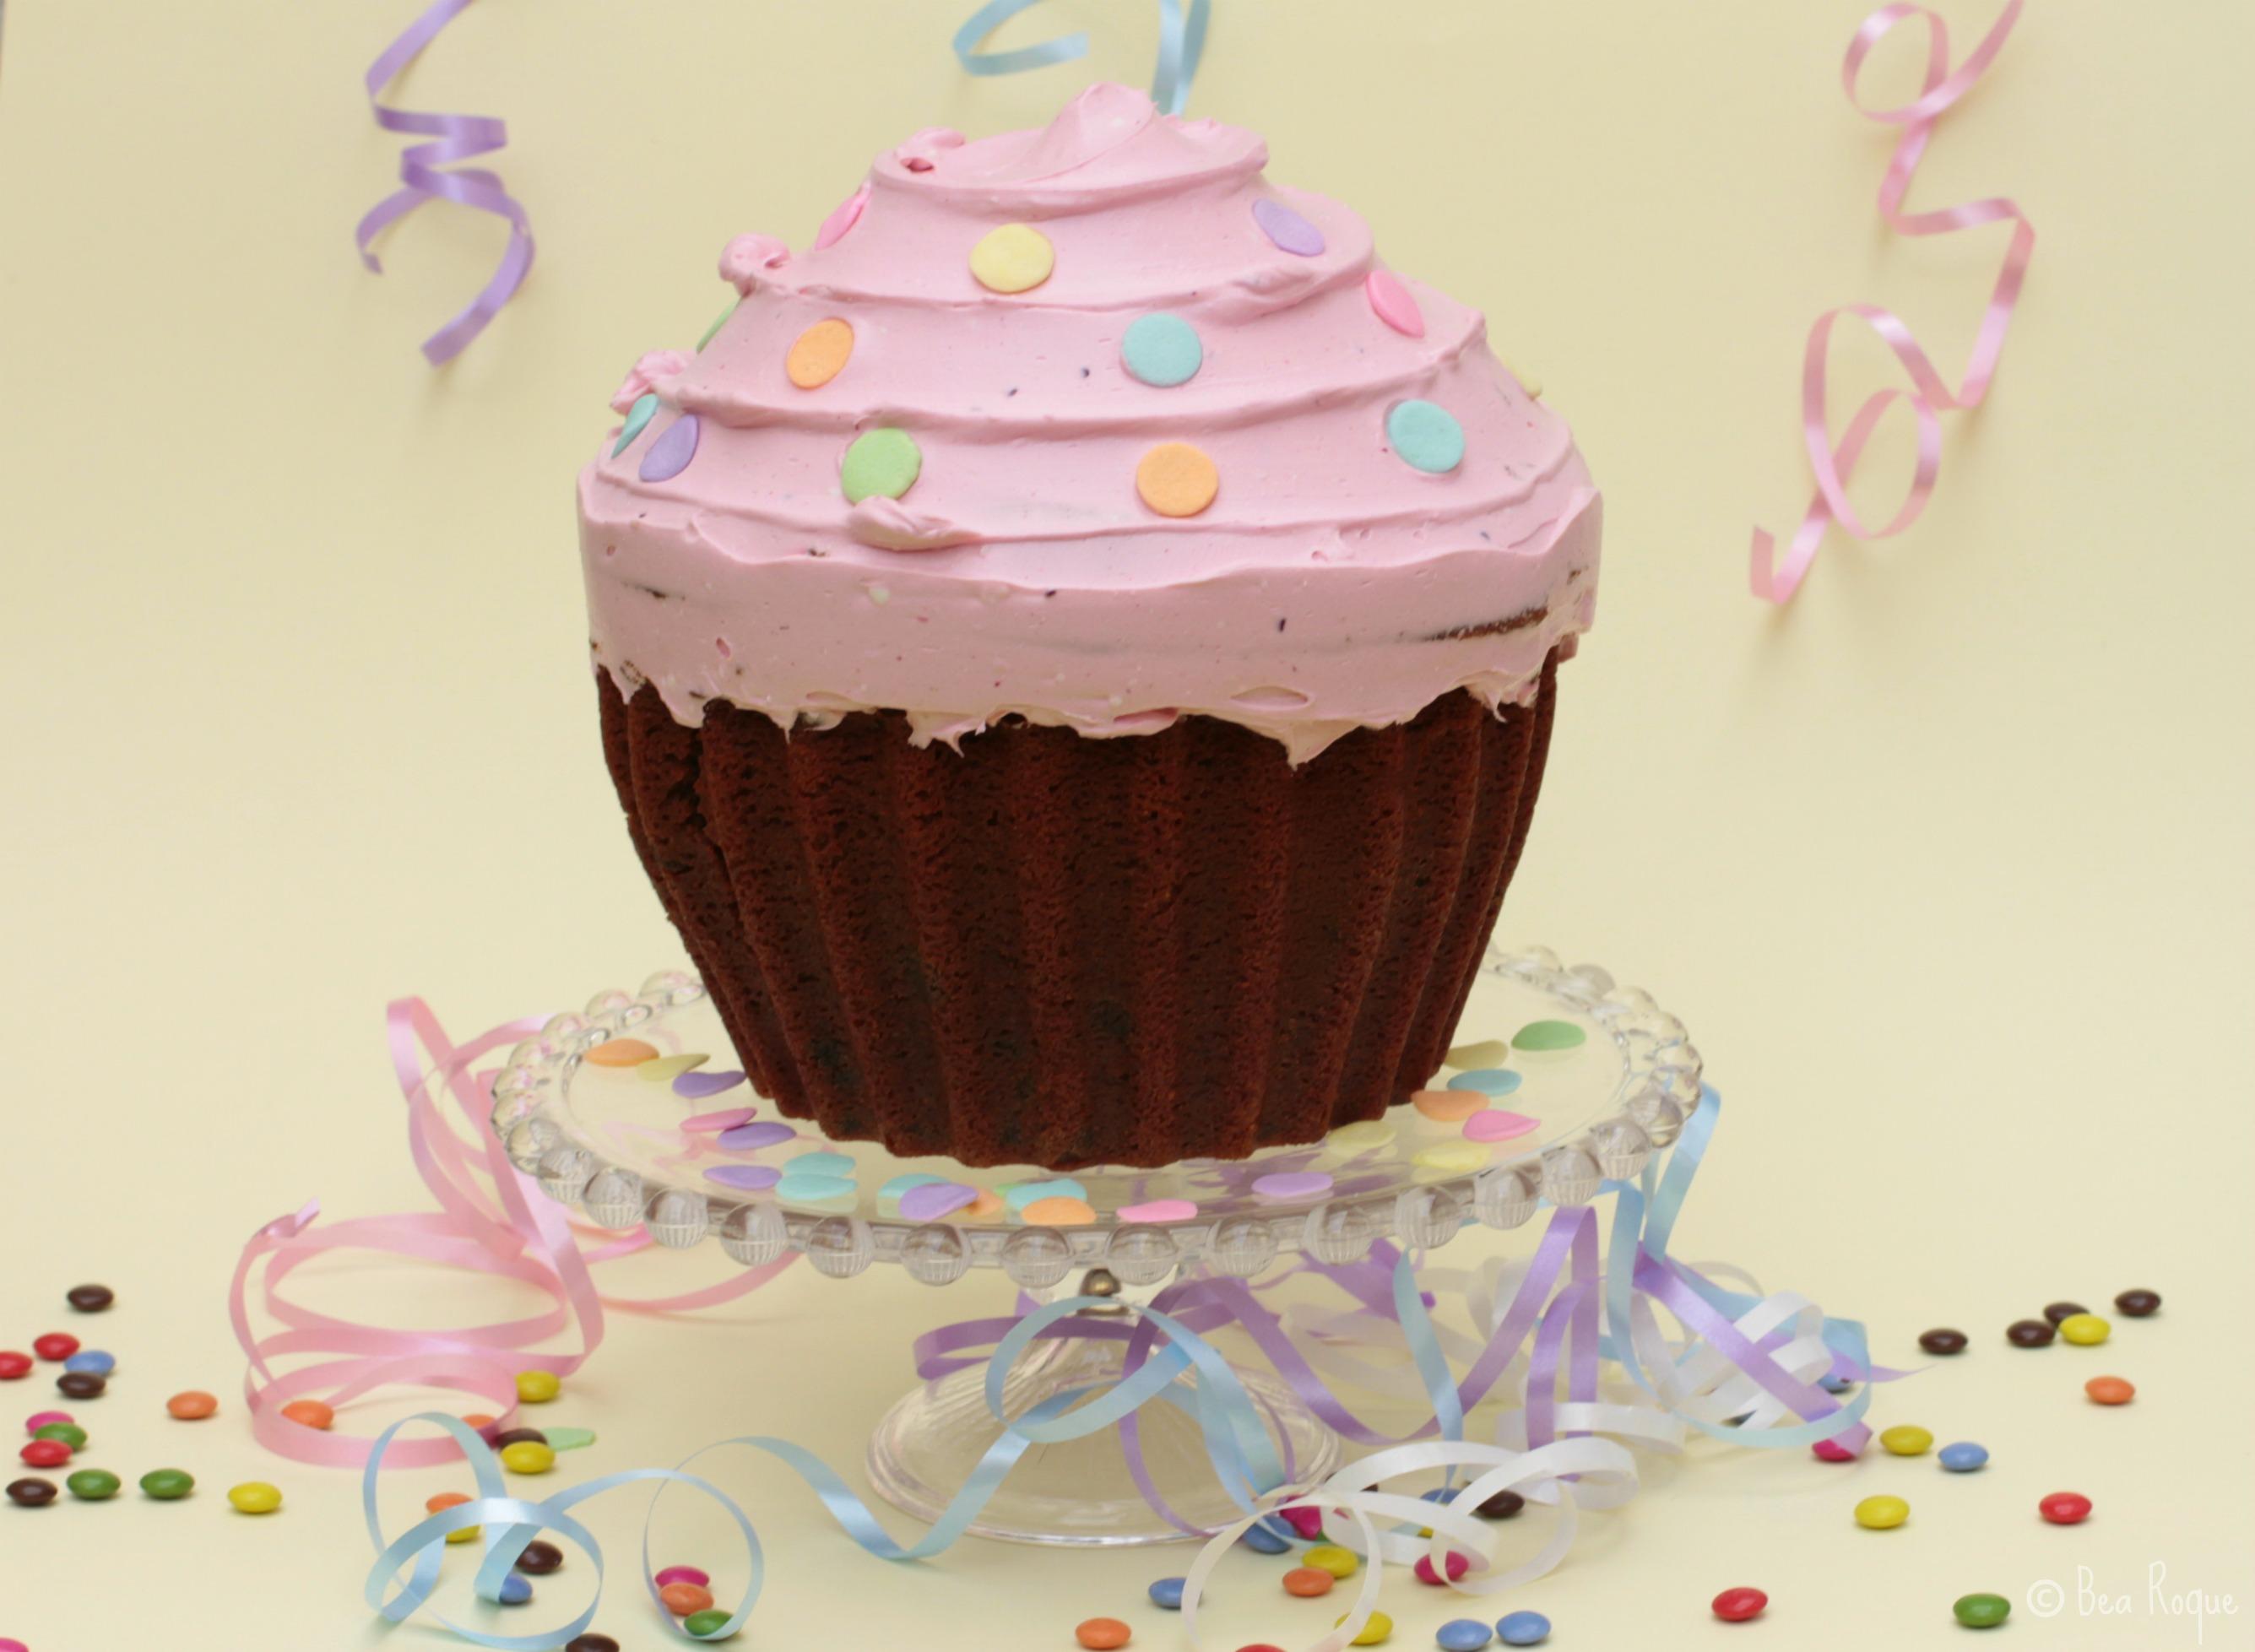 Un cupcake gigante, perfercto para una fiesta infantil